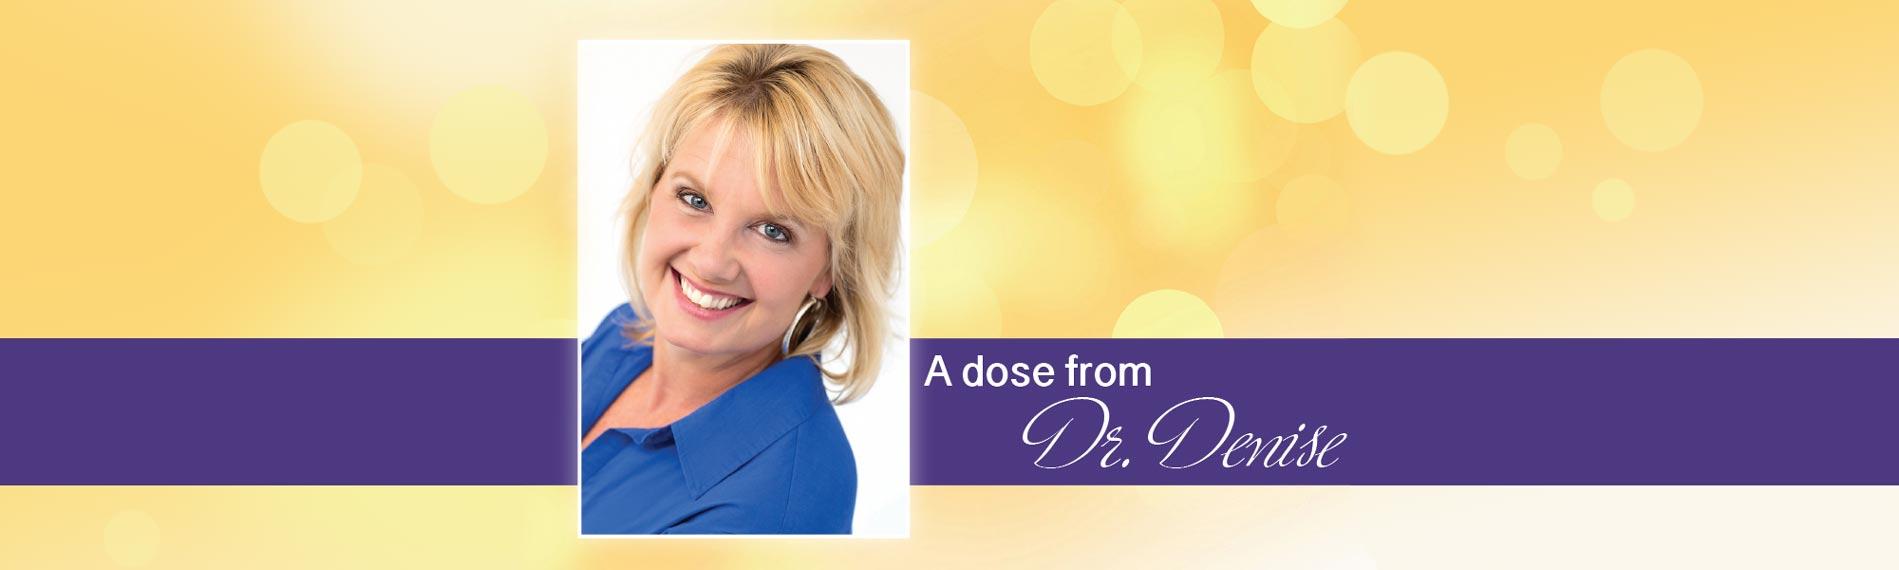 Dr. Denise Chranowski chiropractor Hamilton, NJ